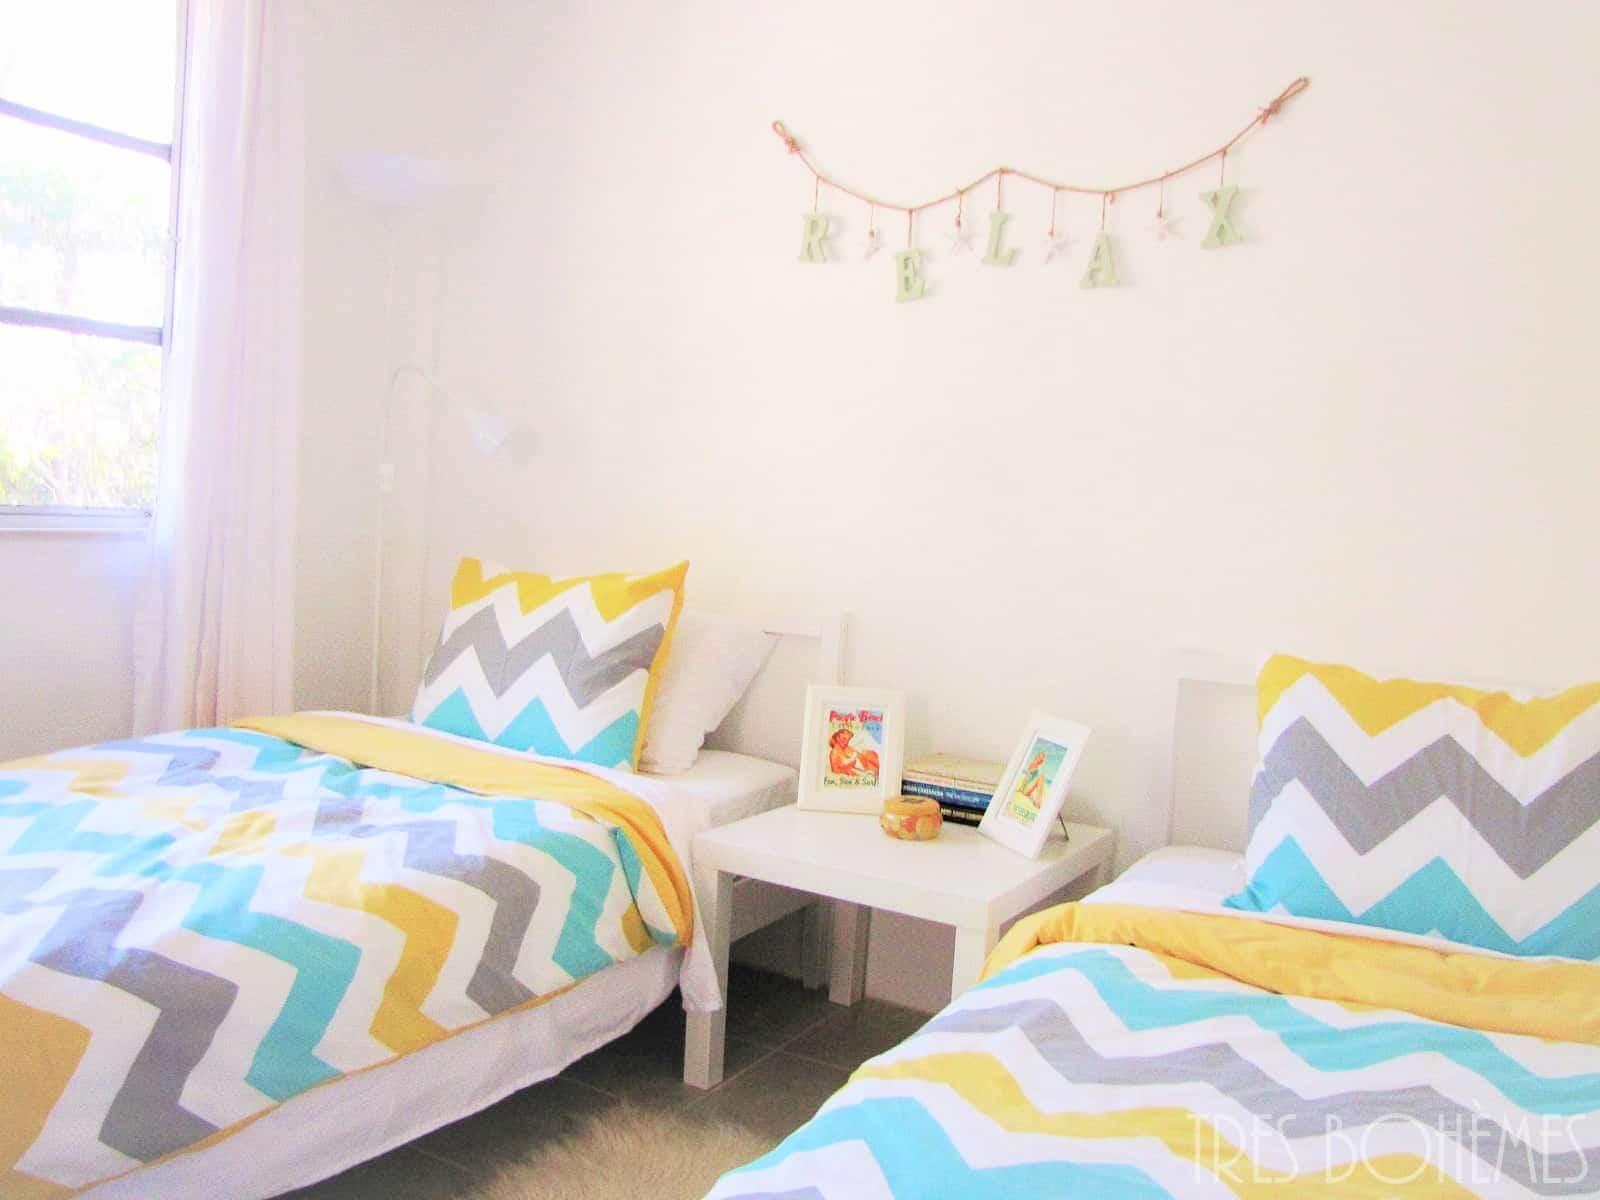 Boho-Decor-Guest-Room-Tres-Bohemes-Chic